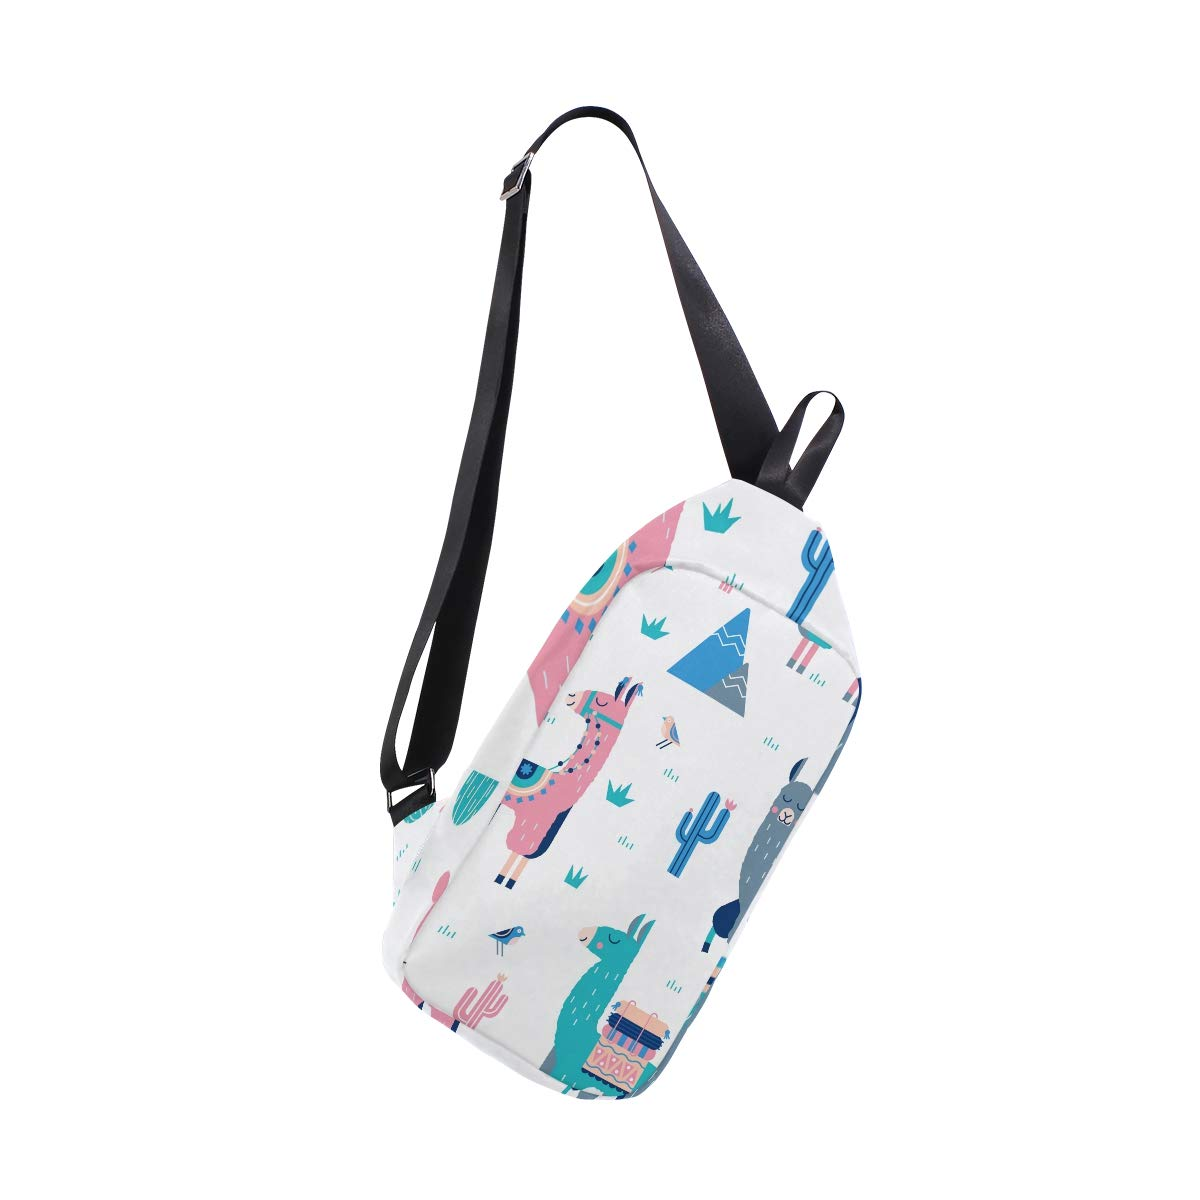 TFONE Cute Llama Crossbody Bag Lightweight Chest Shoulder Messenger Pack Backpack Sling Bag